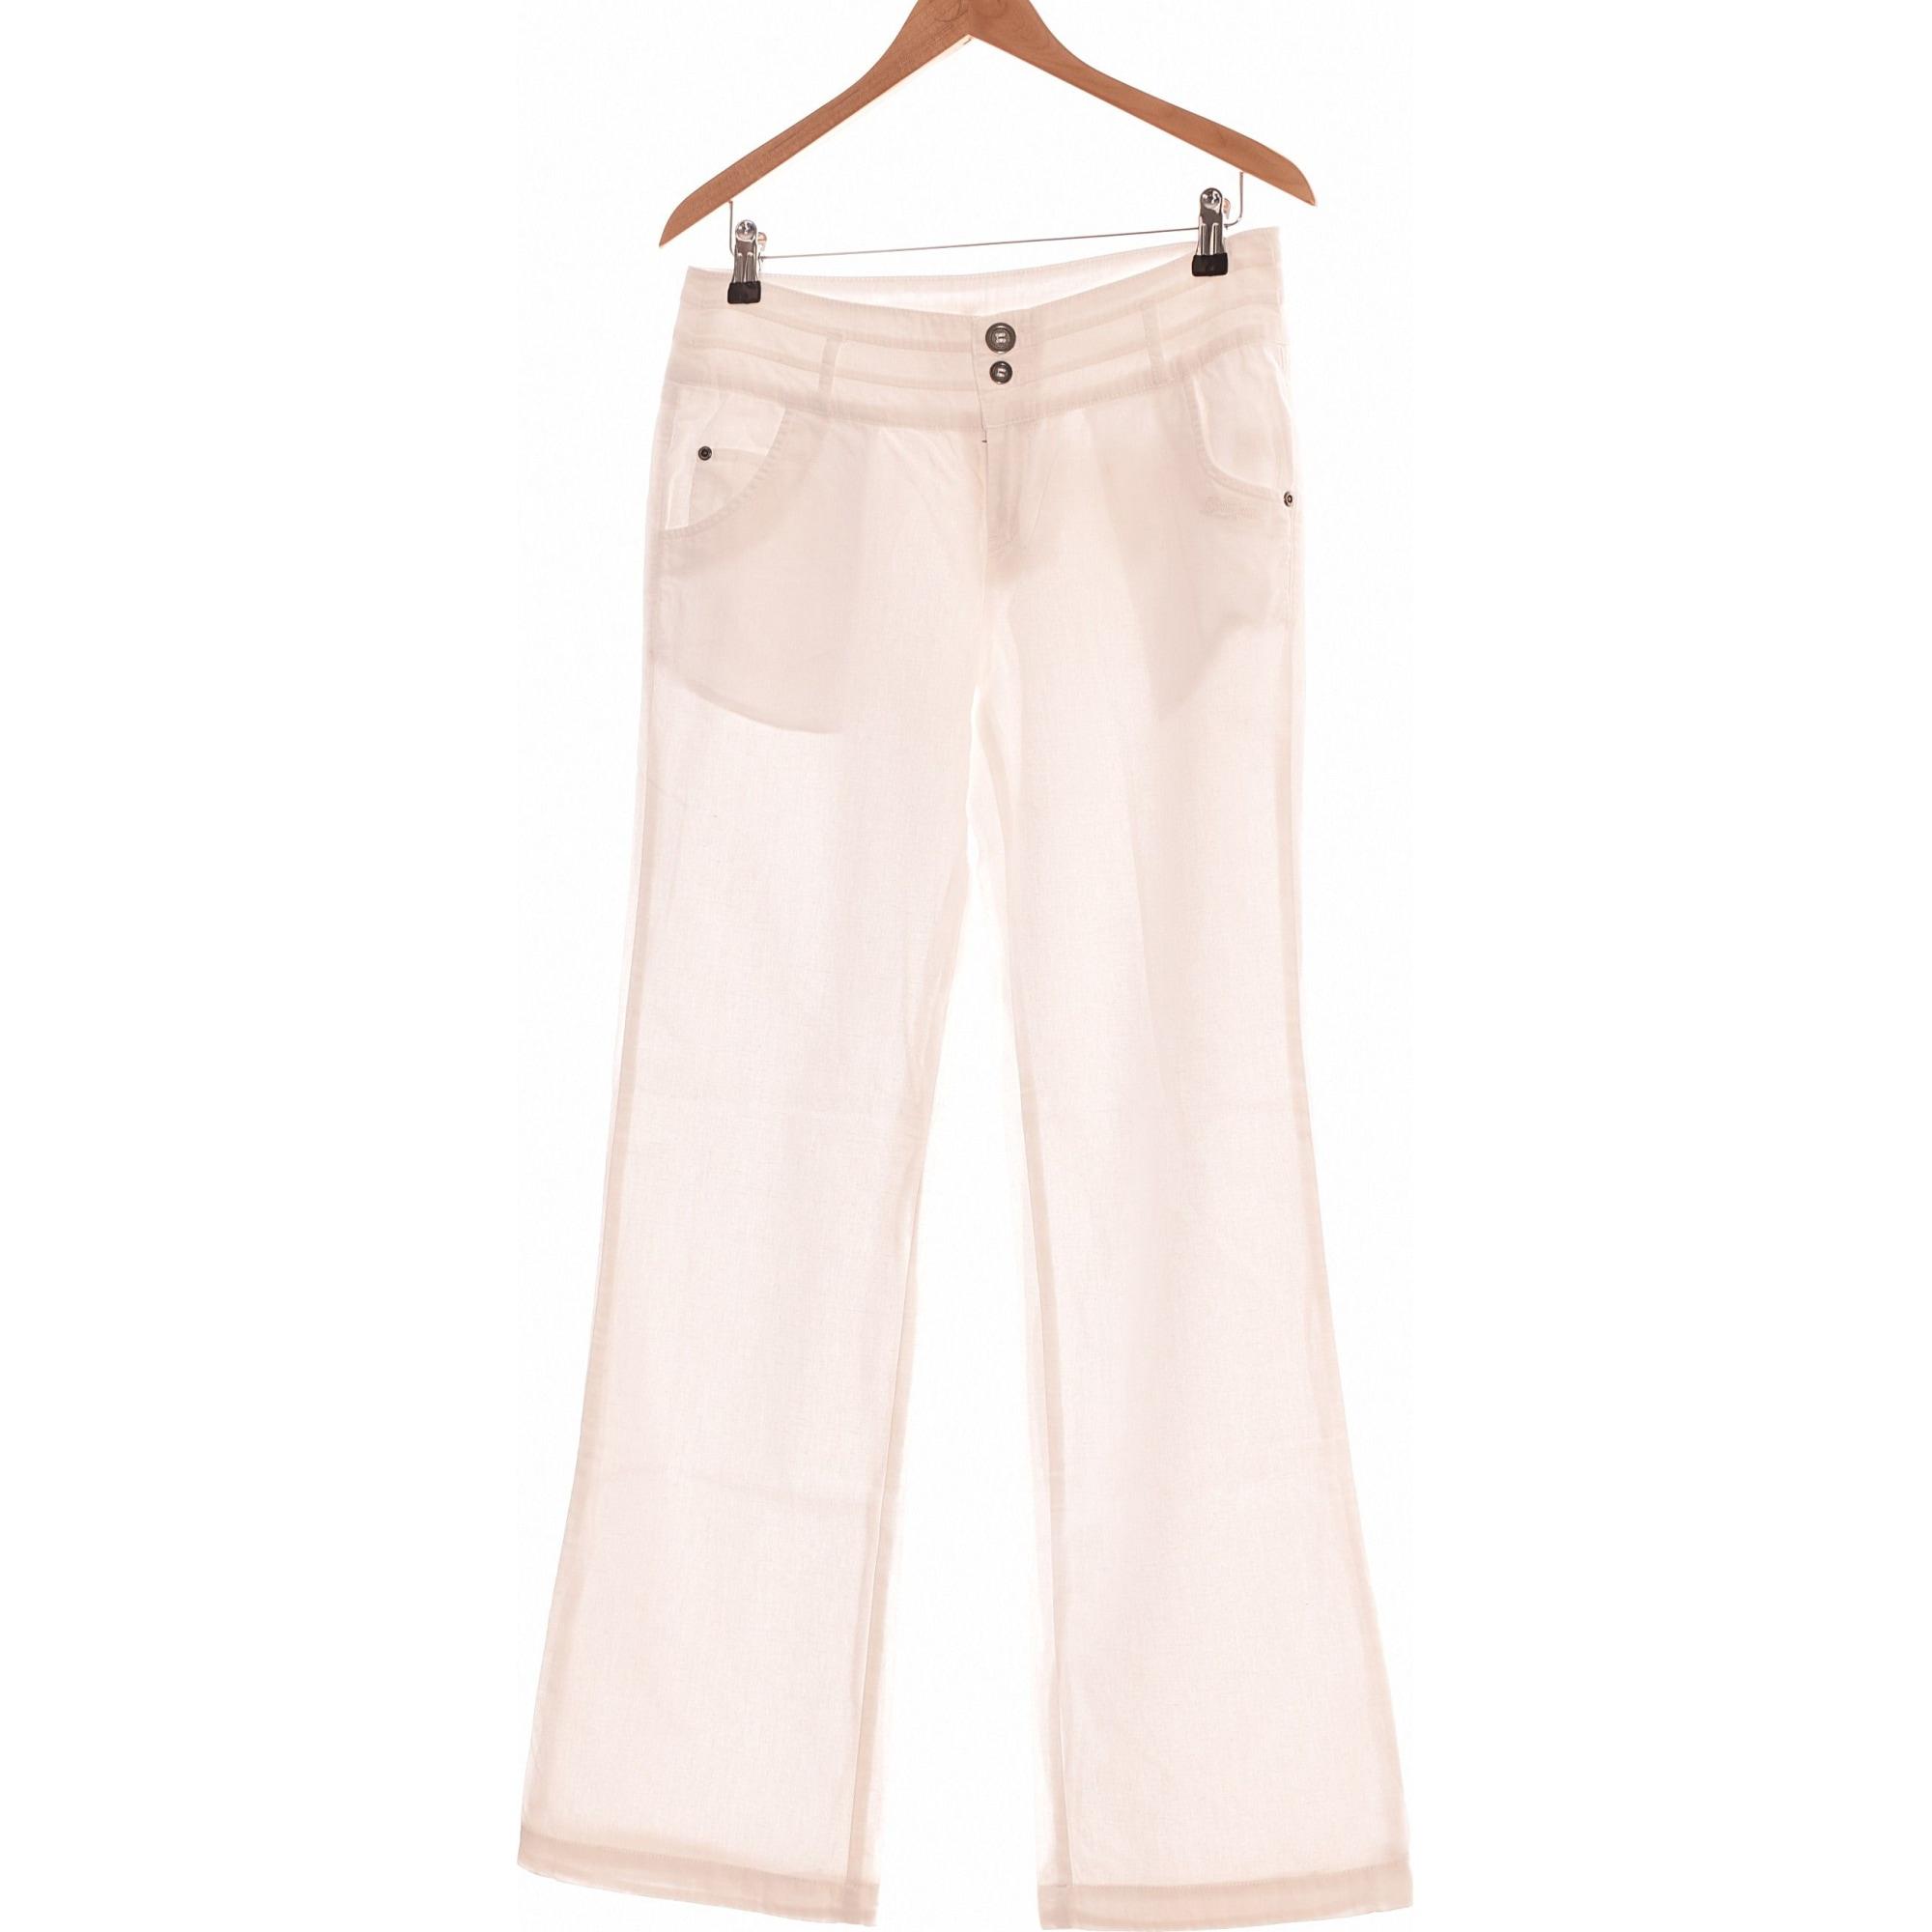 Pantalon droit DDP Blanc, blanc cassé, écru